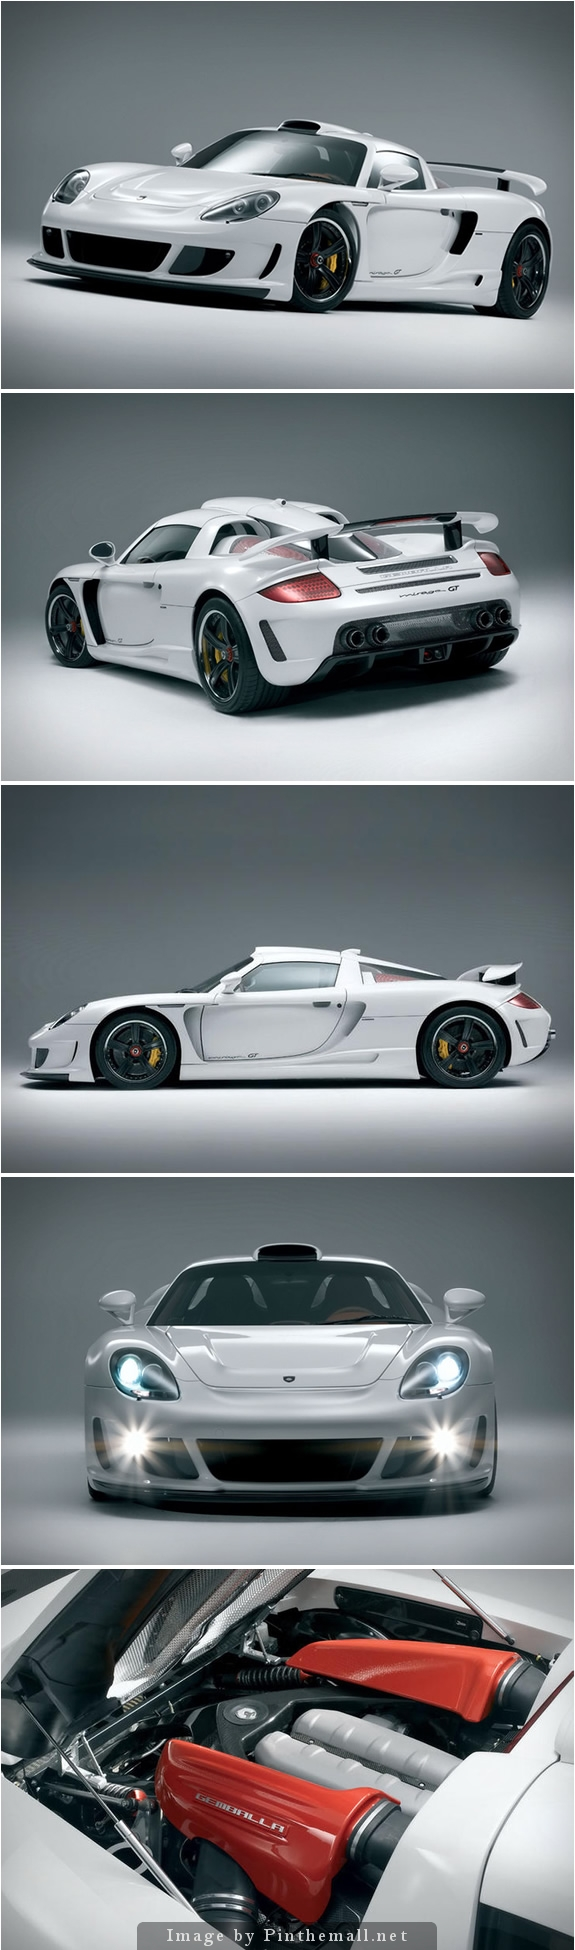 A Grouped Images Picture Porsche Models Ds Automobiles Baby Car Mirror